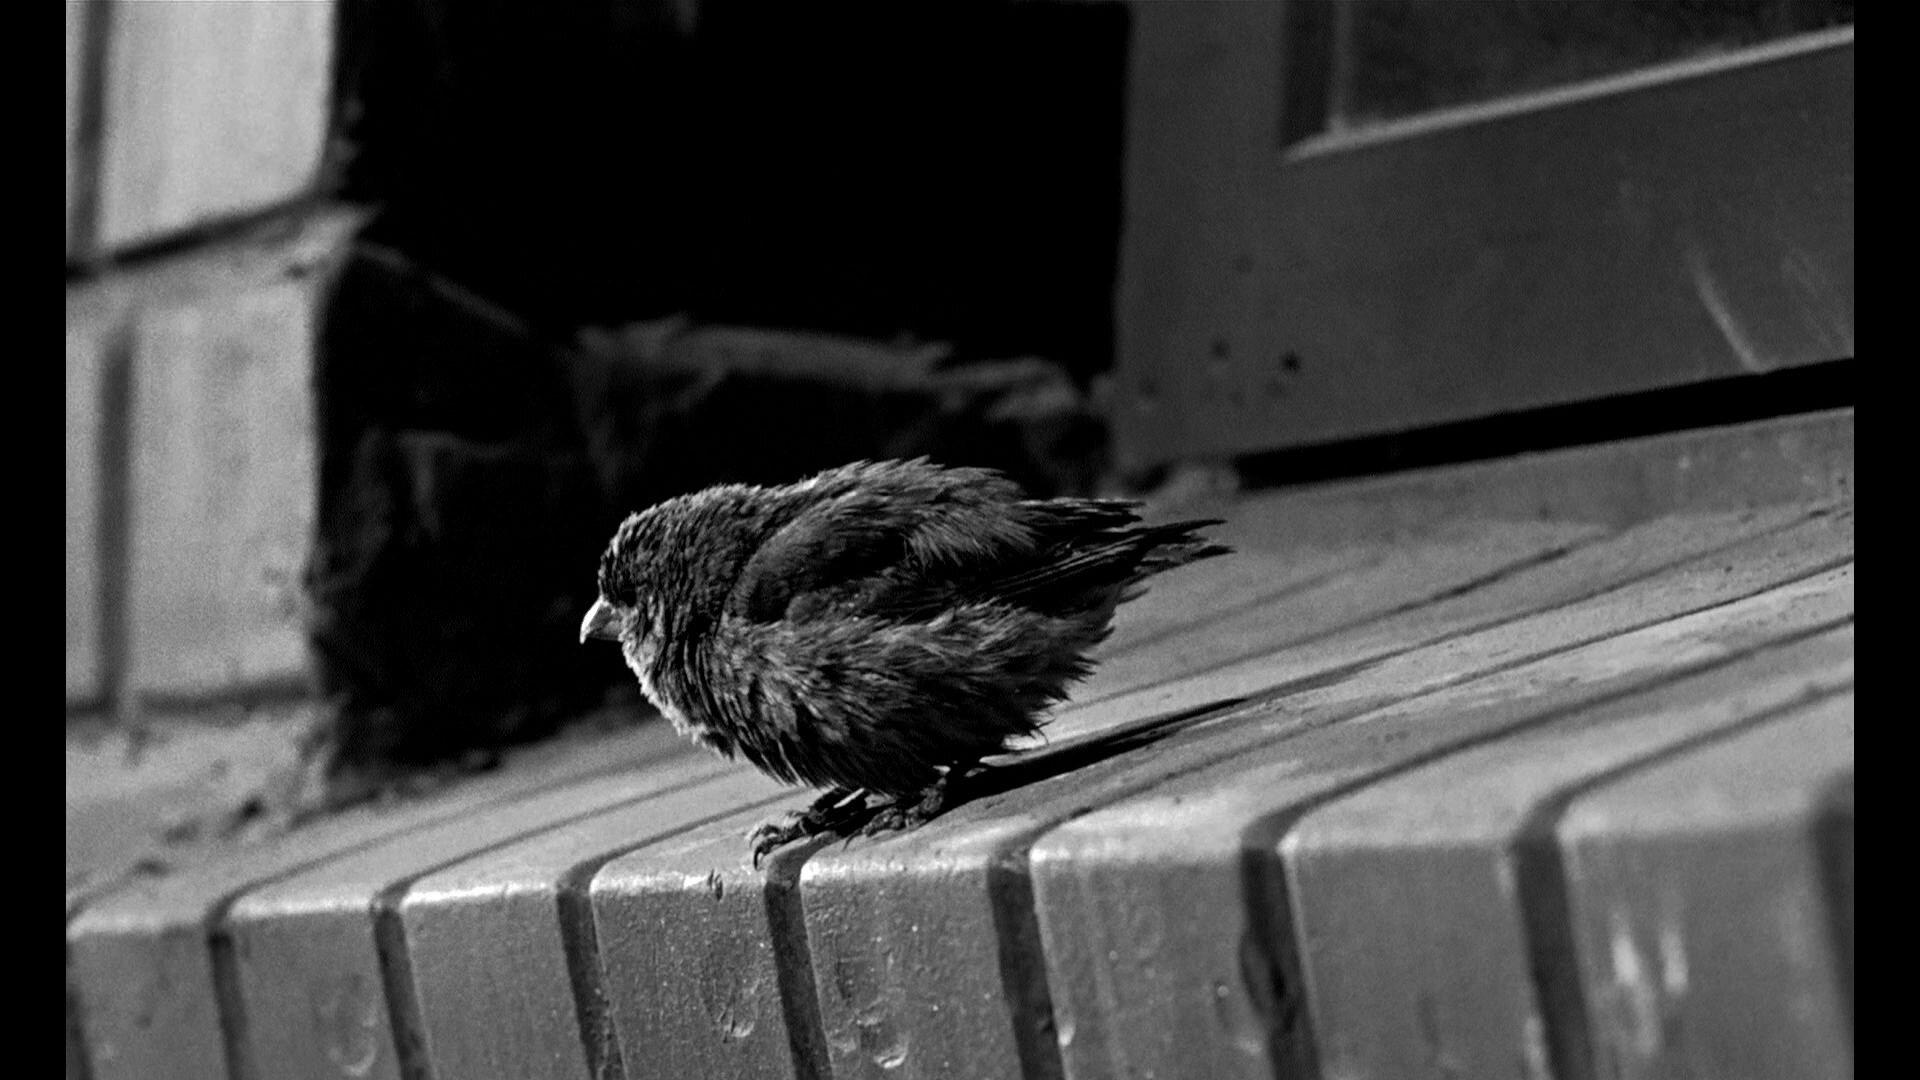 Le Prisonnier Dalcatraz Birdman Of Alcatraz De John